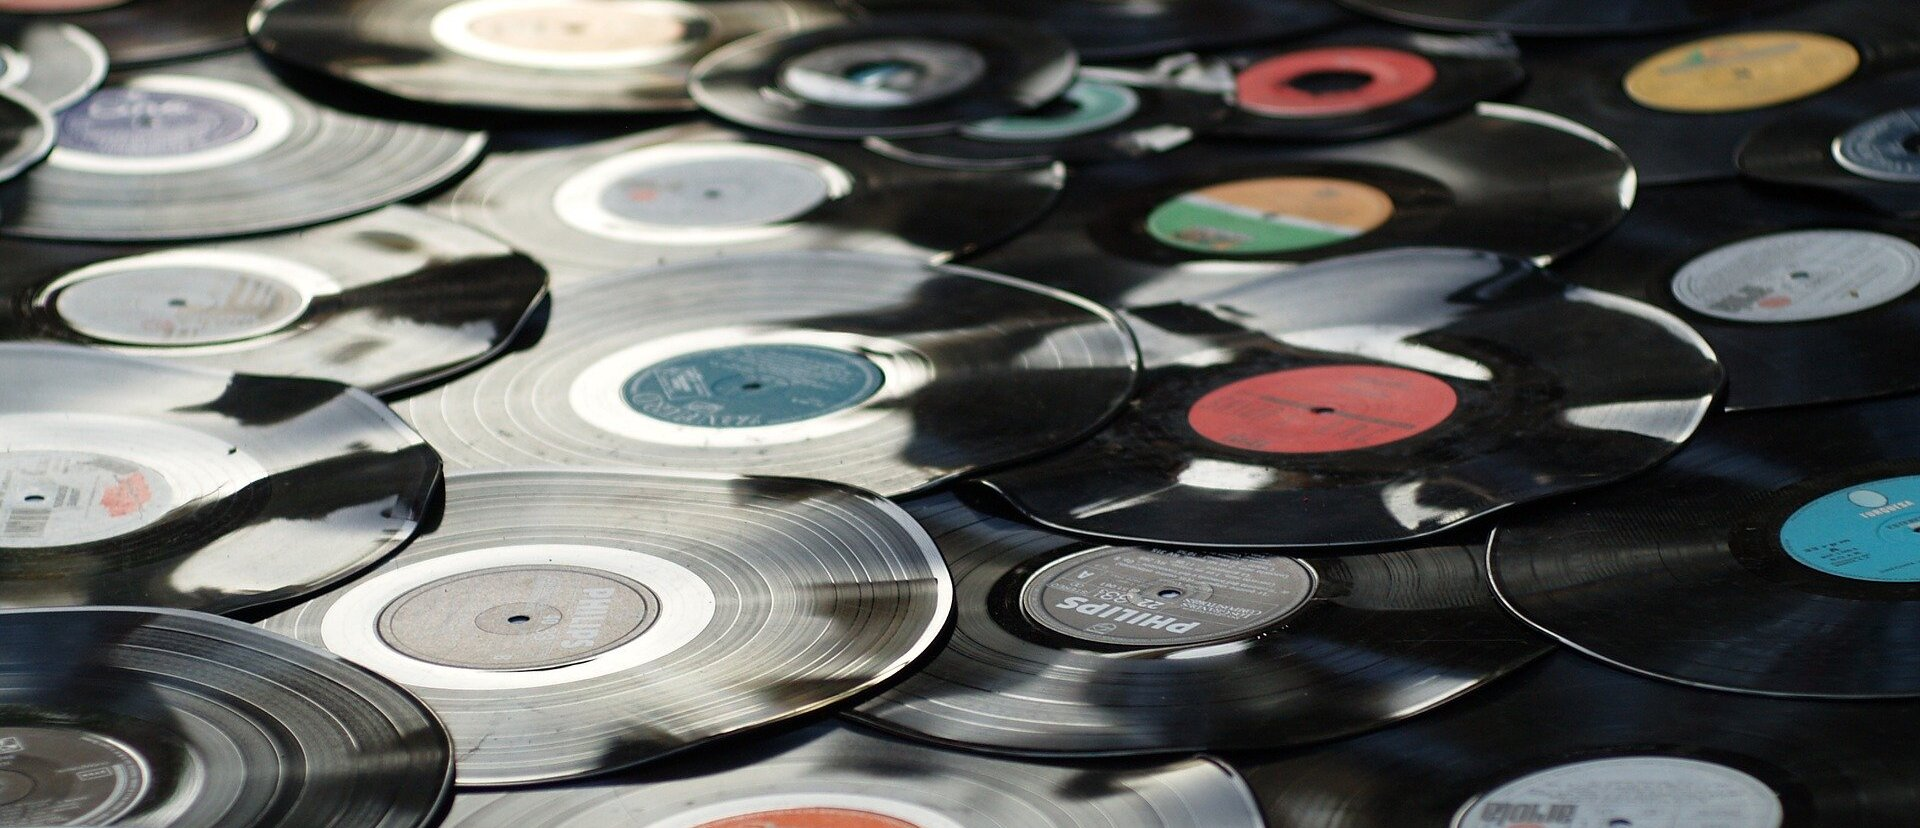 Musik Alben kostenlos downloaden